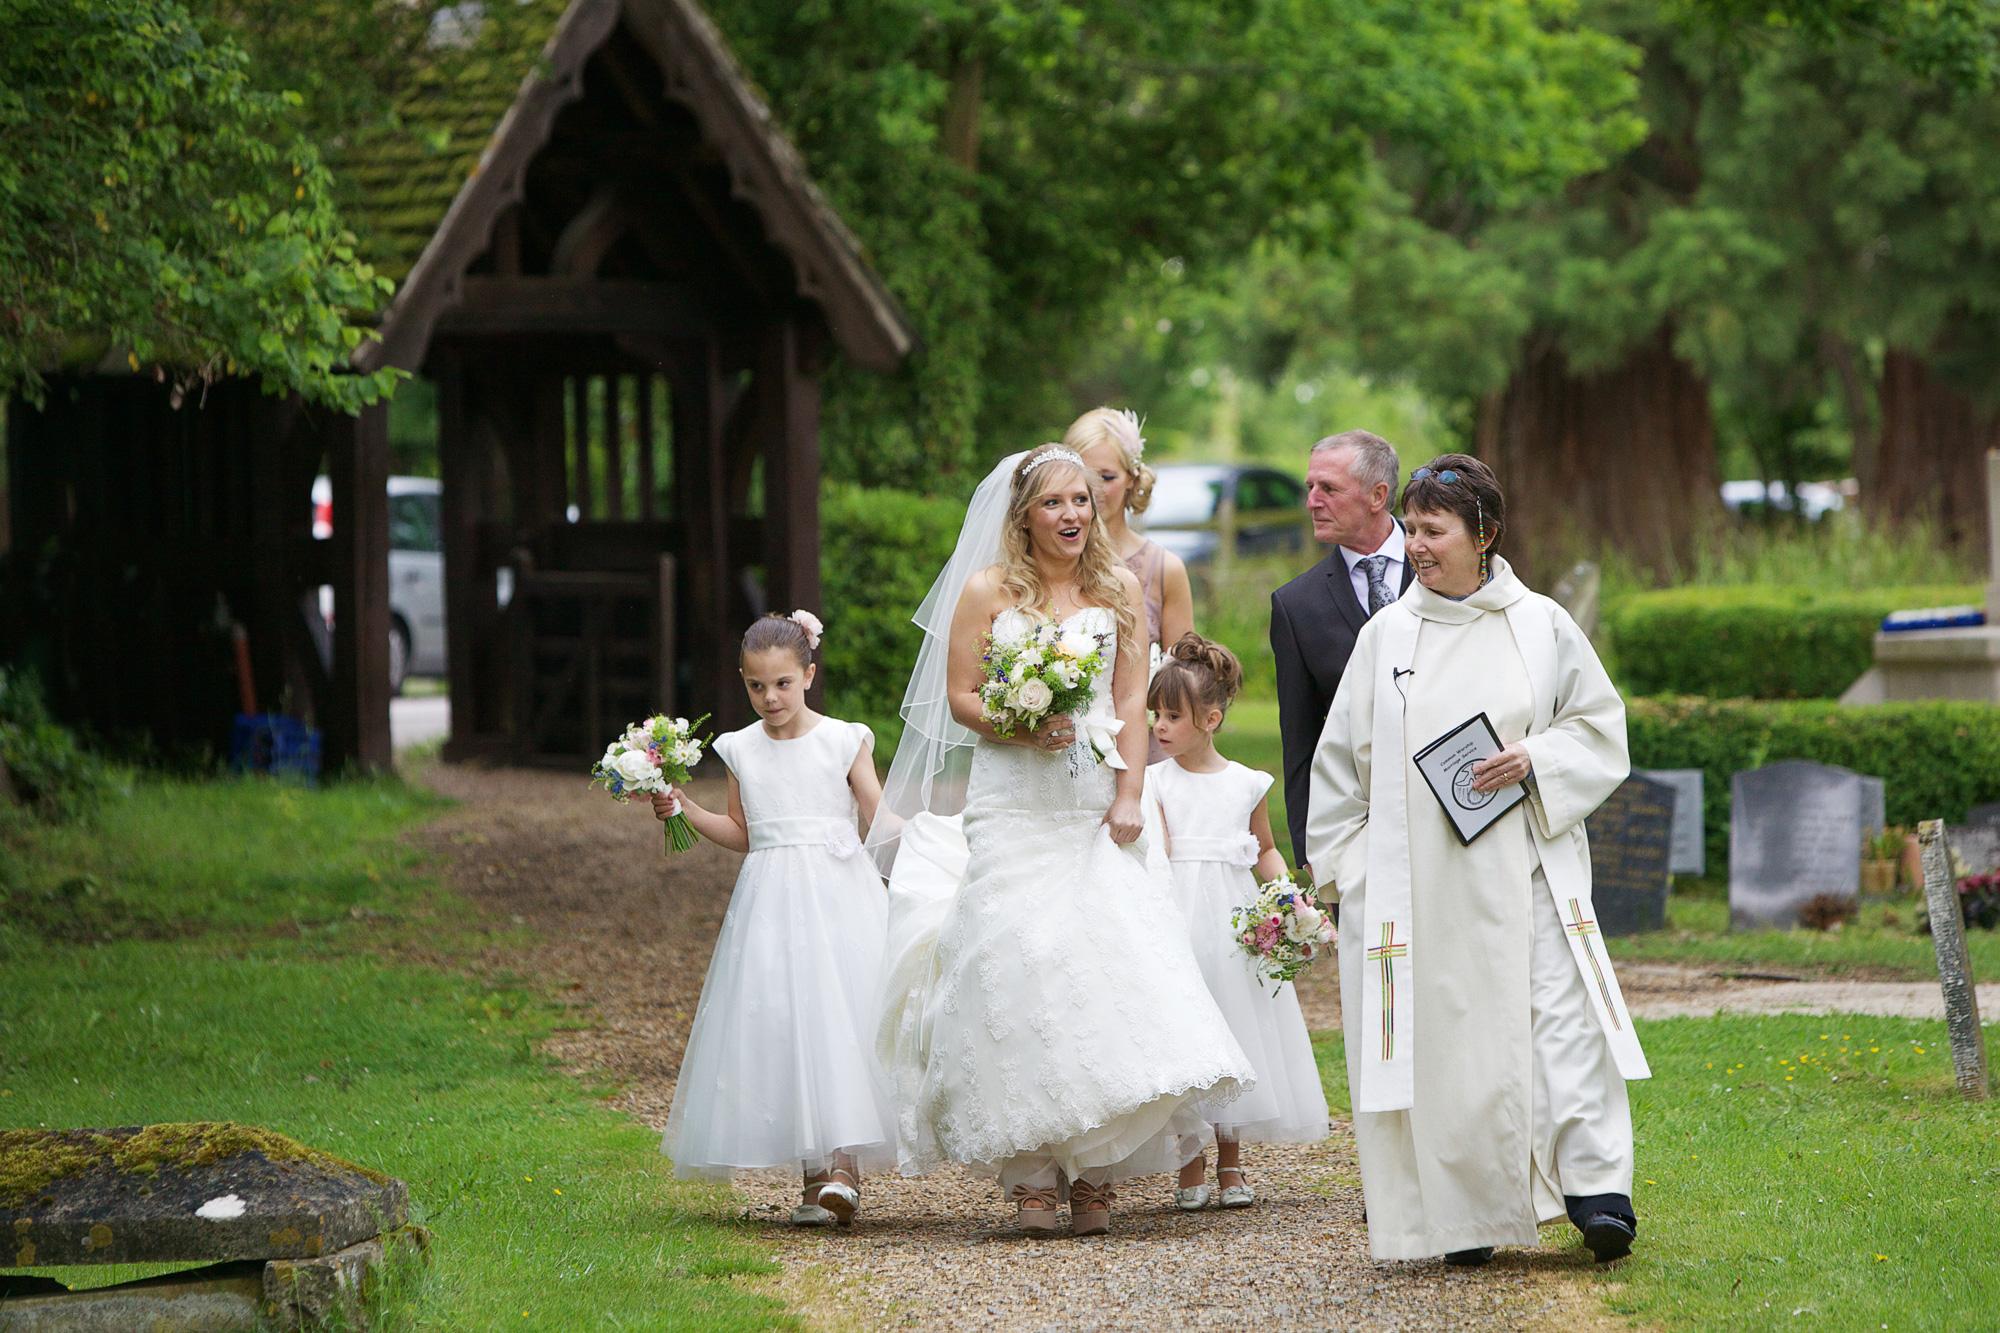 Adam_Hillier_Wedding_Photographer_Newbury_Berkshire_3 (3).jpg